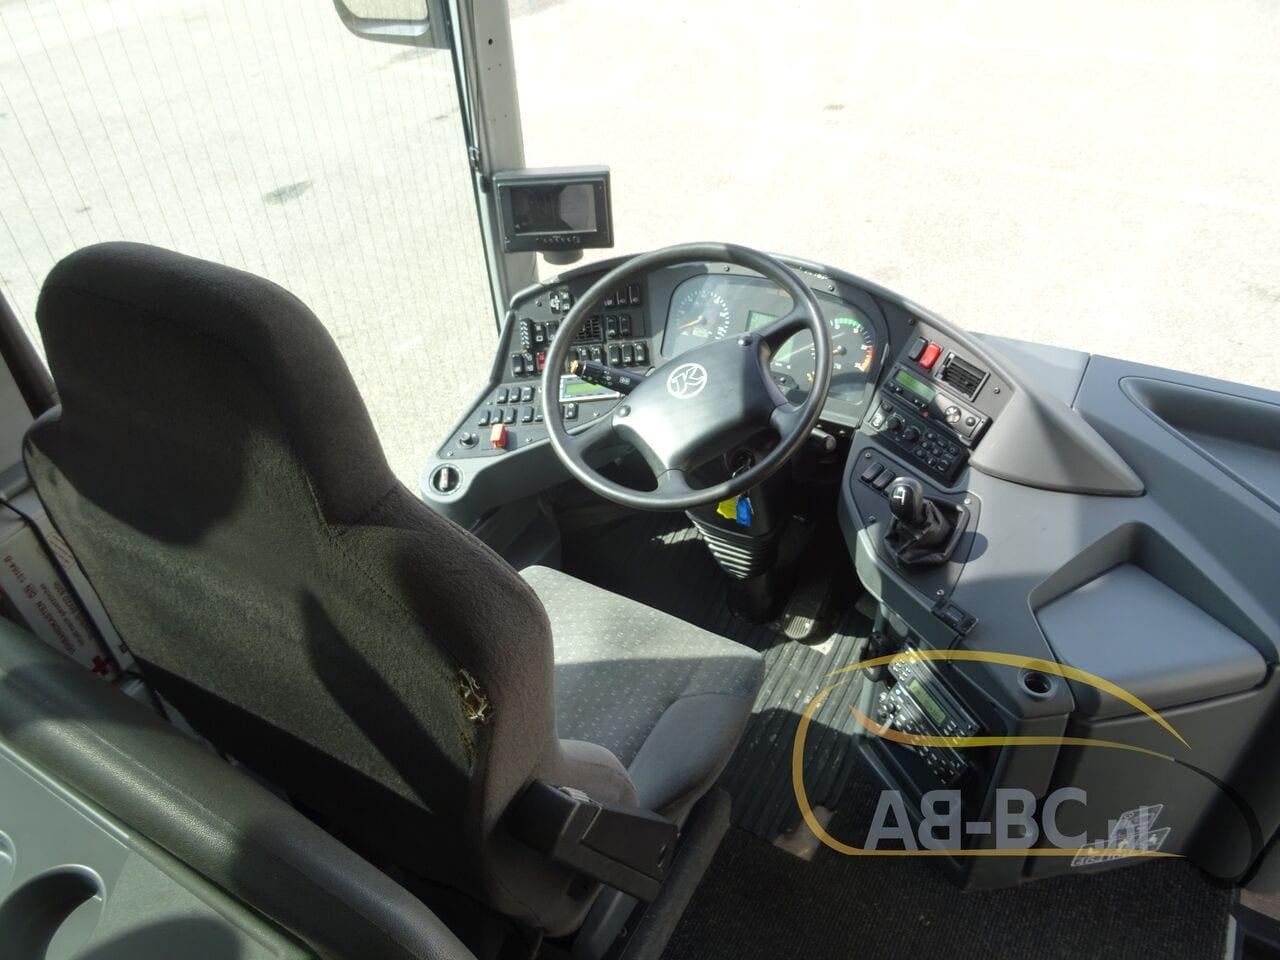 coach-busSETRA-S416H-48-SEATS-LIFTBUS---1620309996365012794_big_a52b714456bf22f0a16b51b00804993a--21050616581387095000